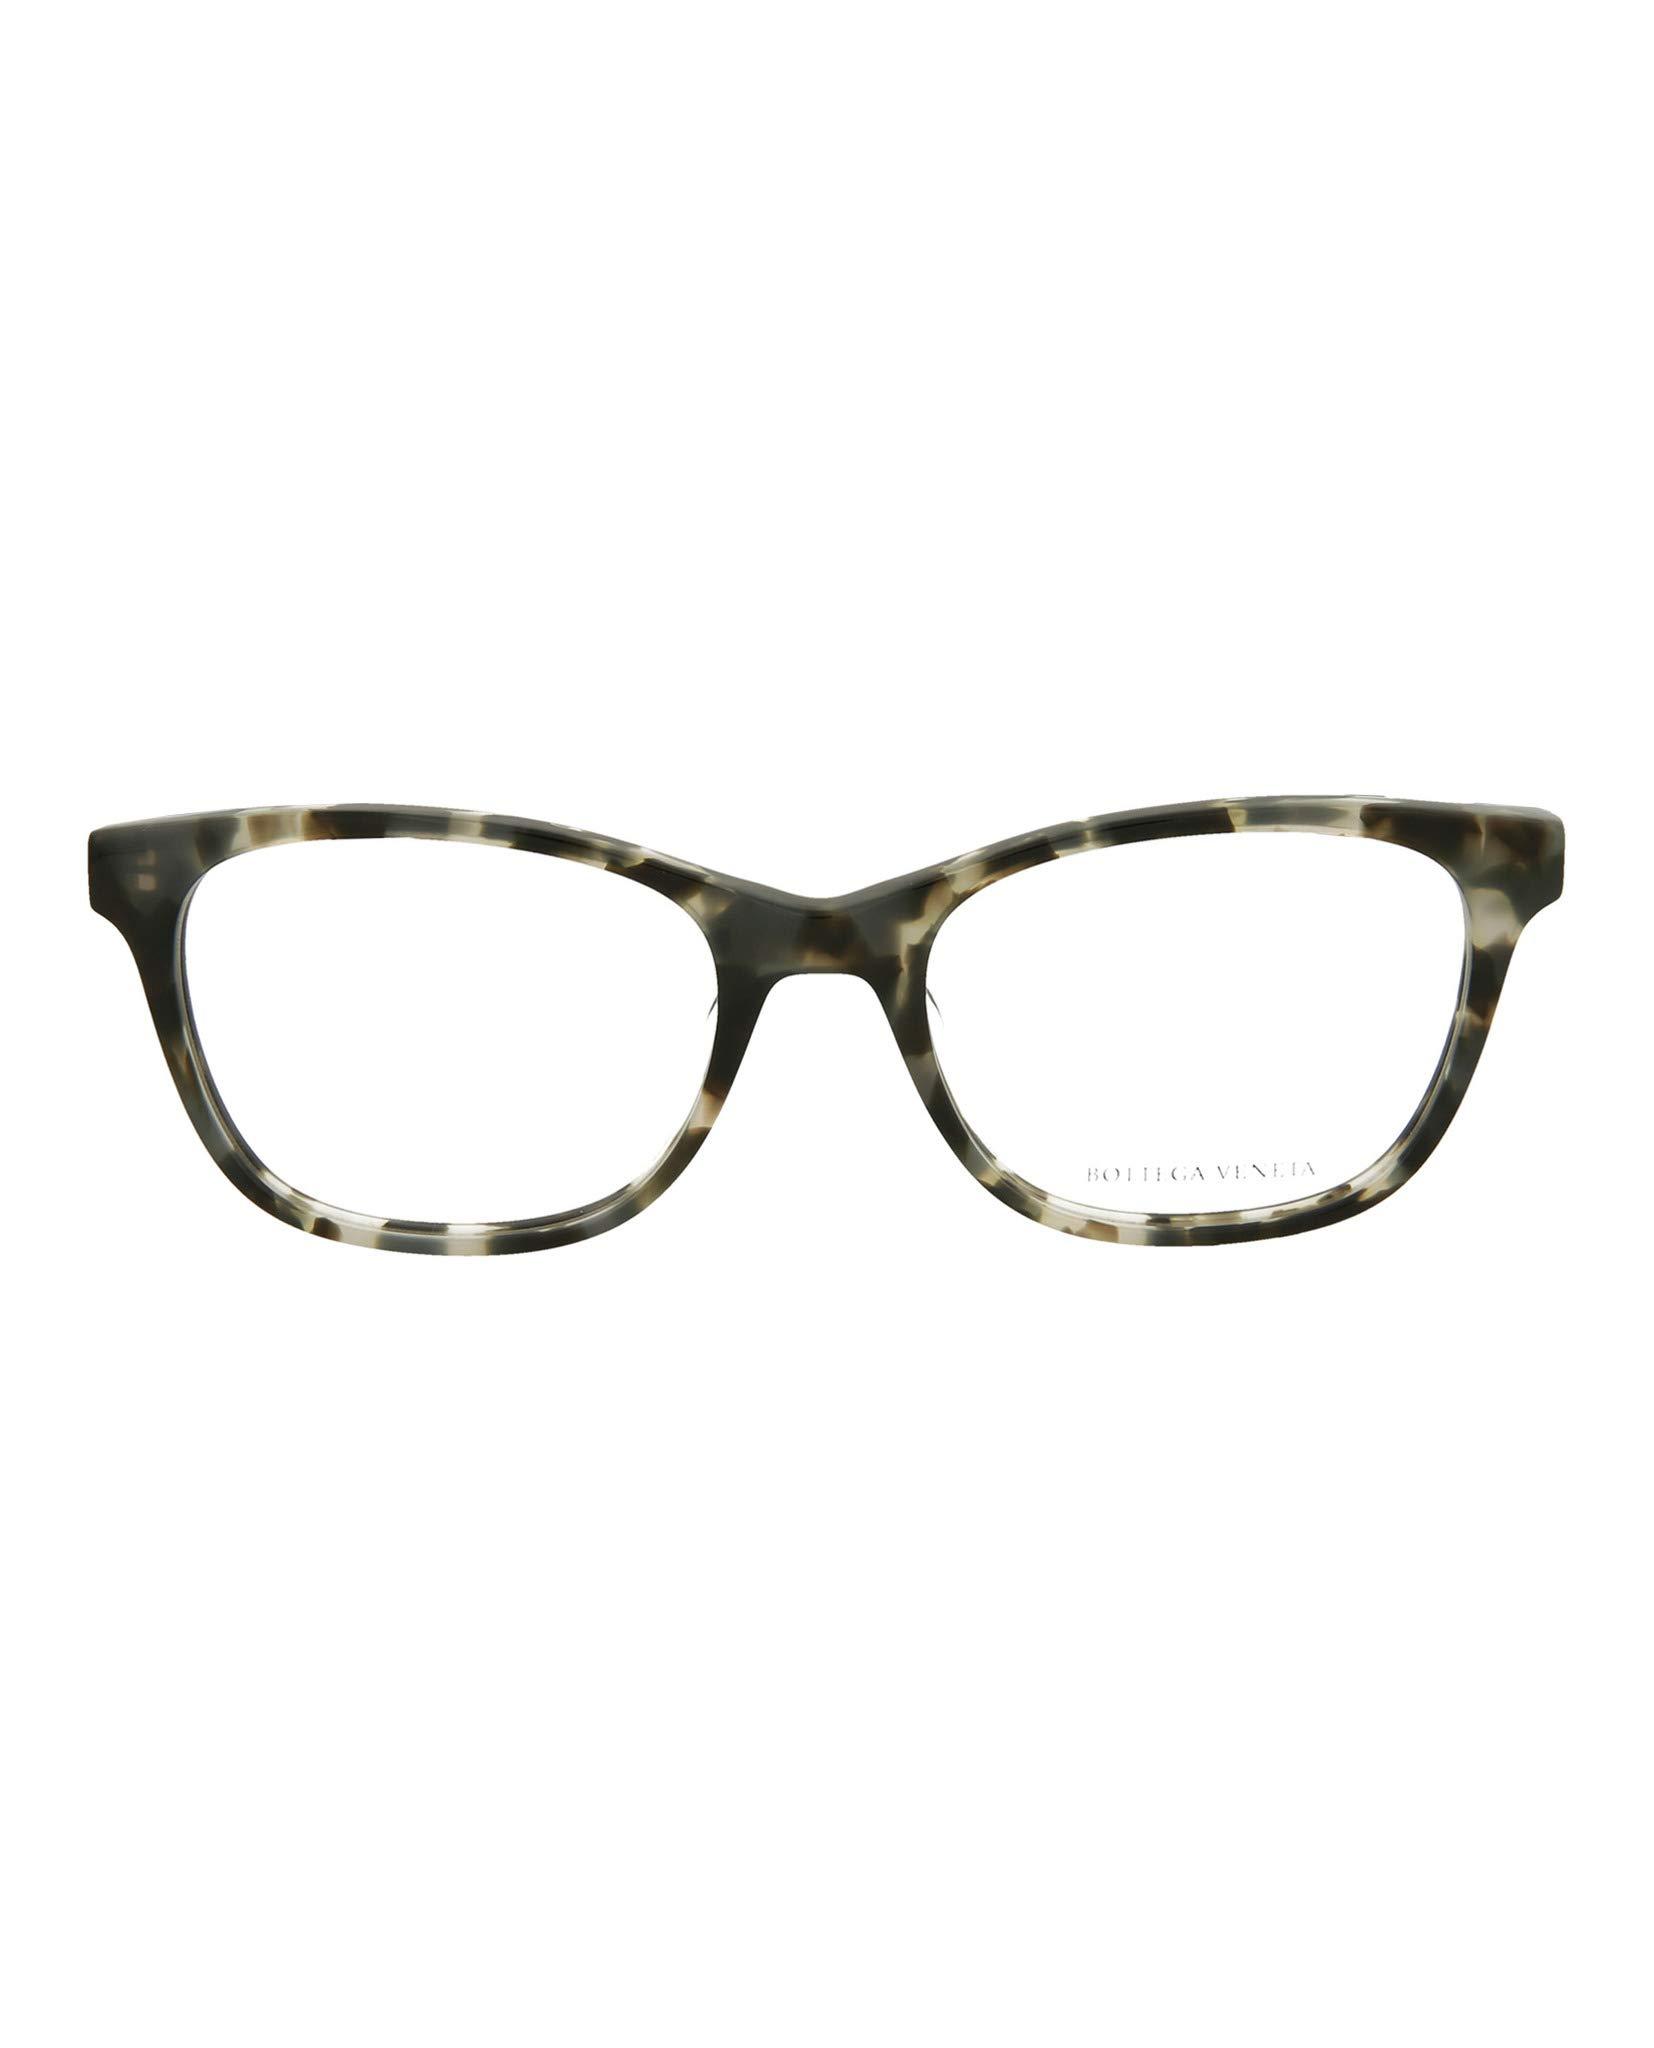 Bottega Veneta Womens Cat Eye Optical Frames BV0024O-30000269-003 by Bottega Veneta